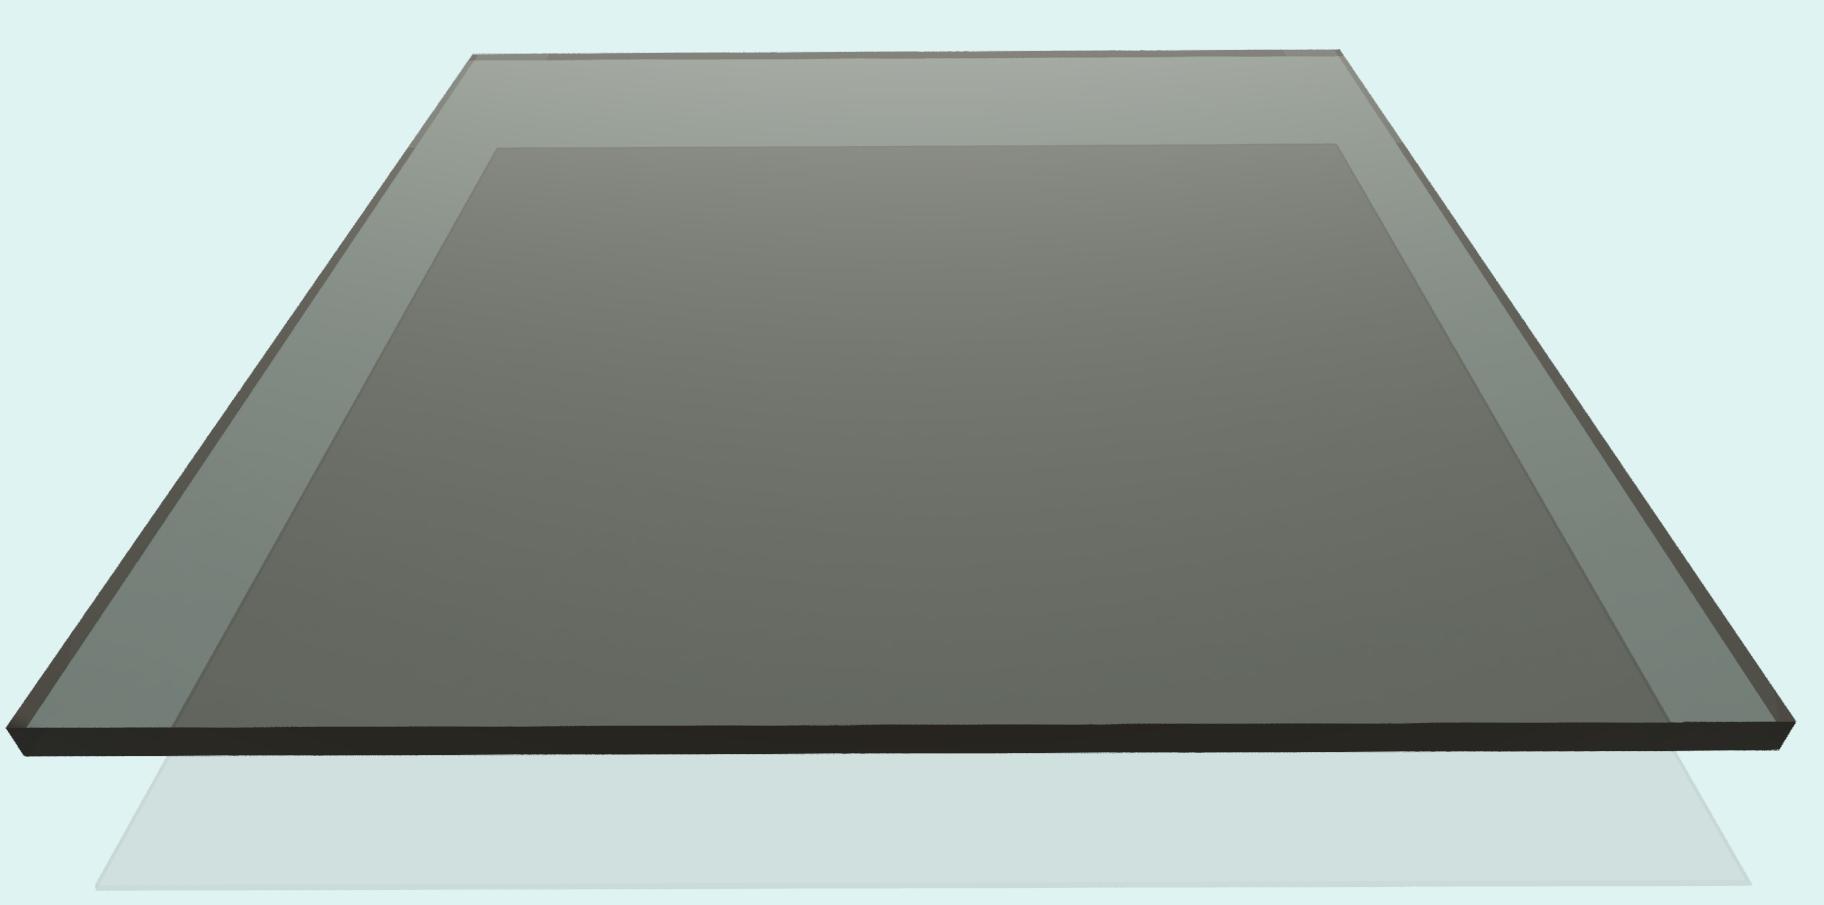 Plexiglas 5 mm, rauchfarben